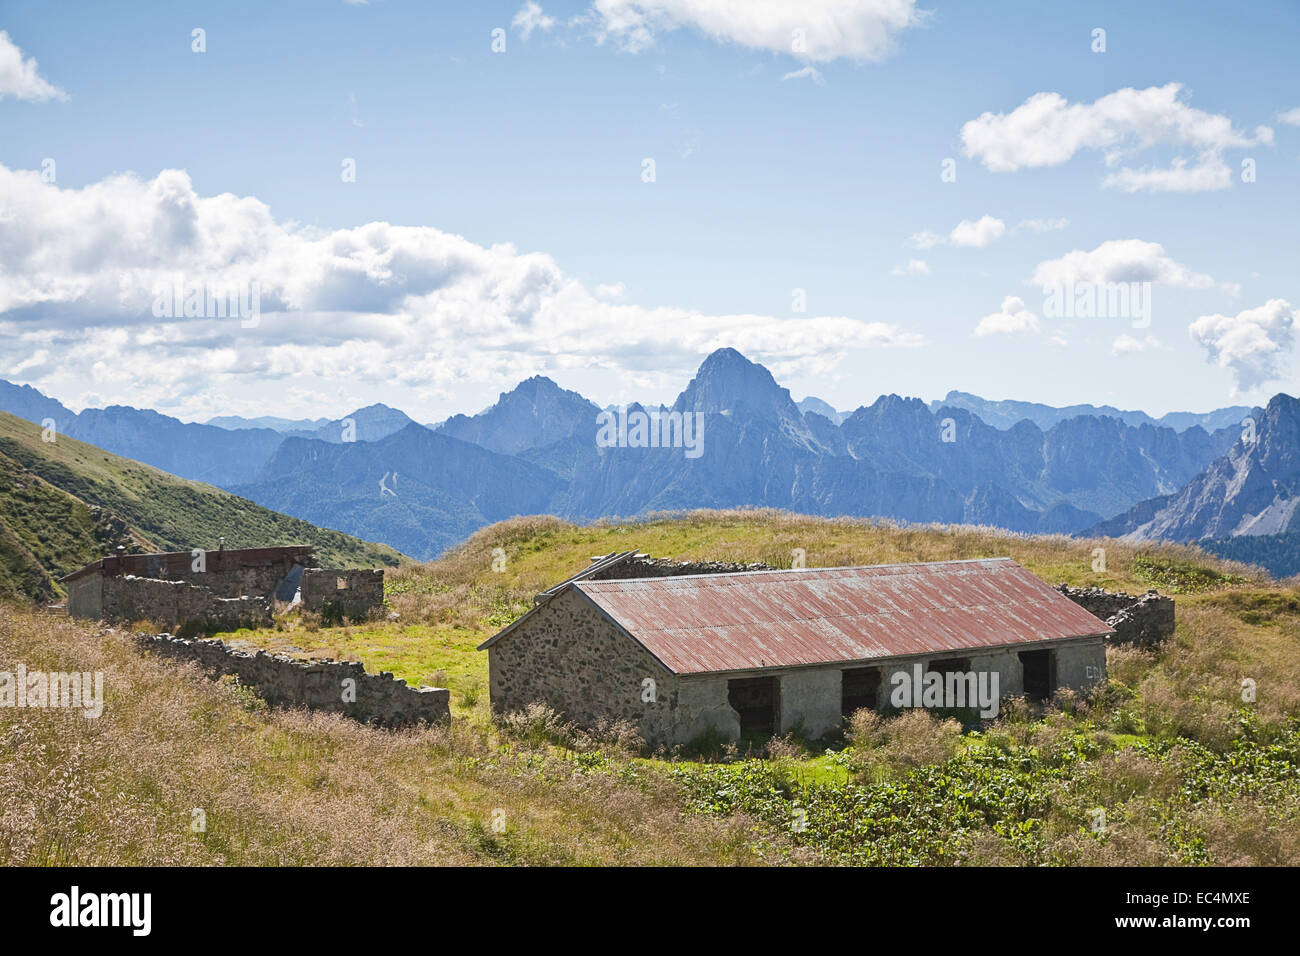 Idyllic alpine hut in the southeastern Alps - Stock Image